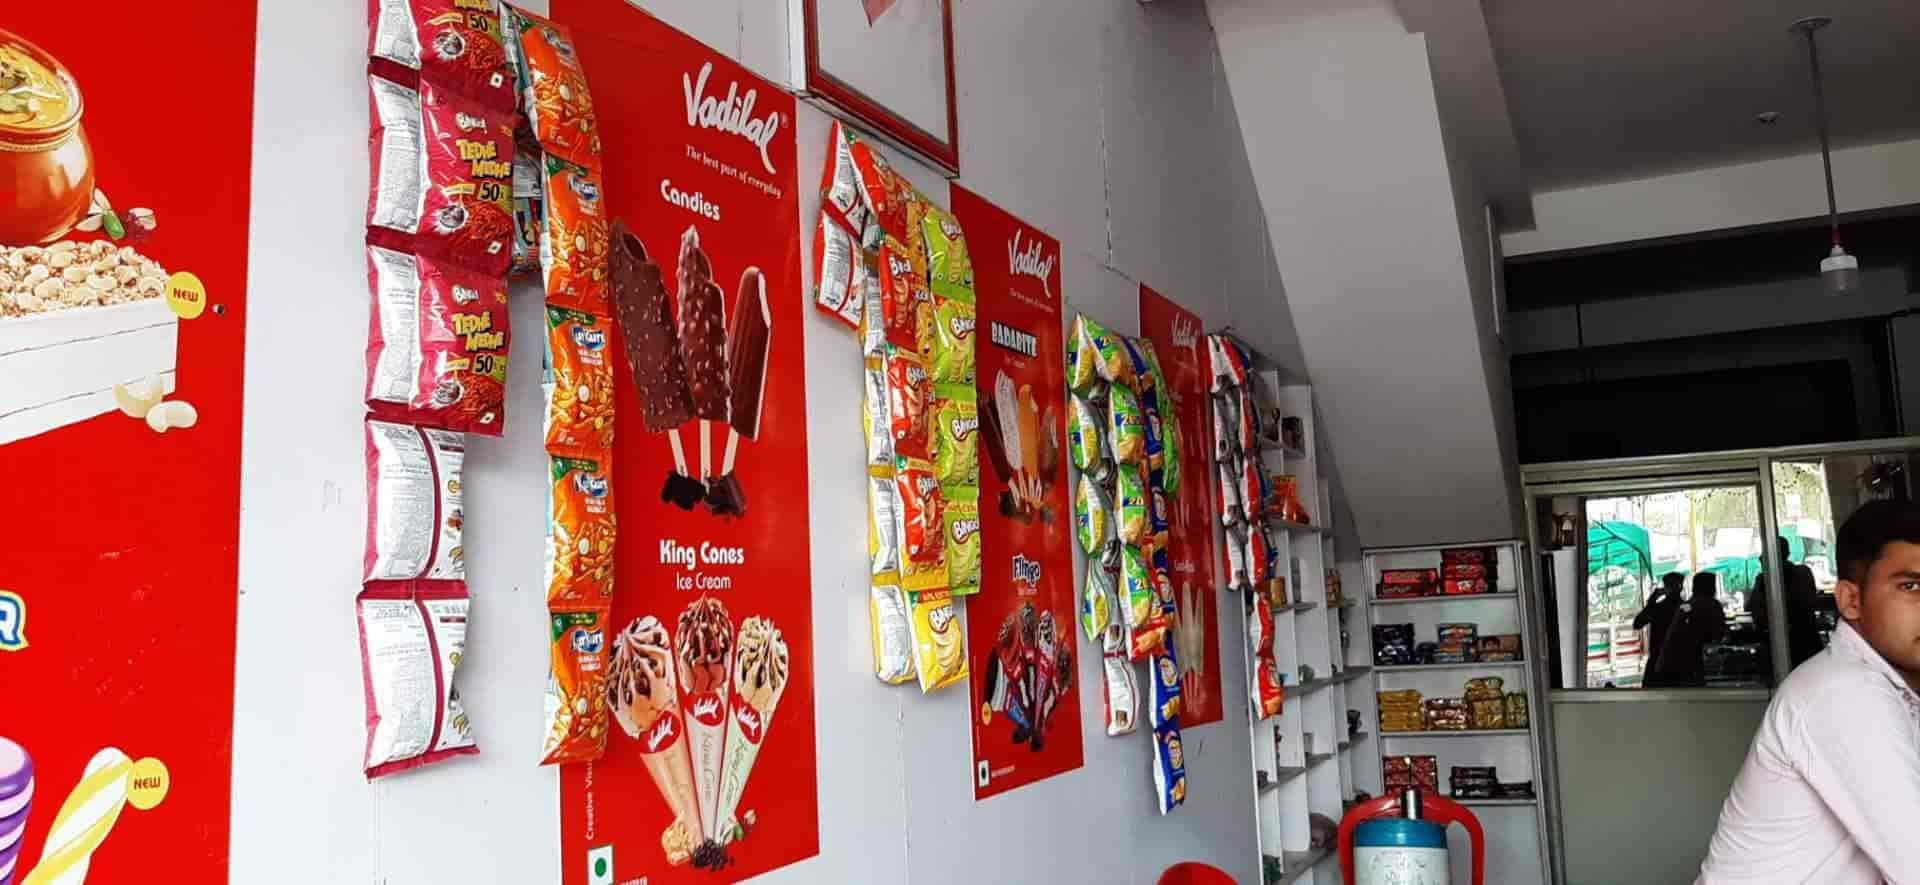 Superb Vadilal Ice Cream Showroom Photos Dhar Pictures Images Download Free Architecture Designs Scobabritishbridgeorg